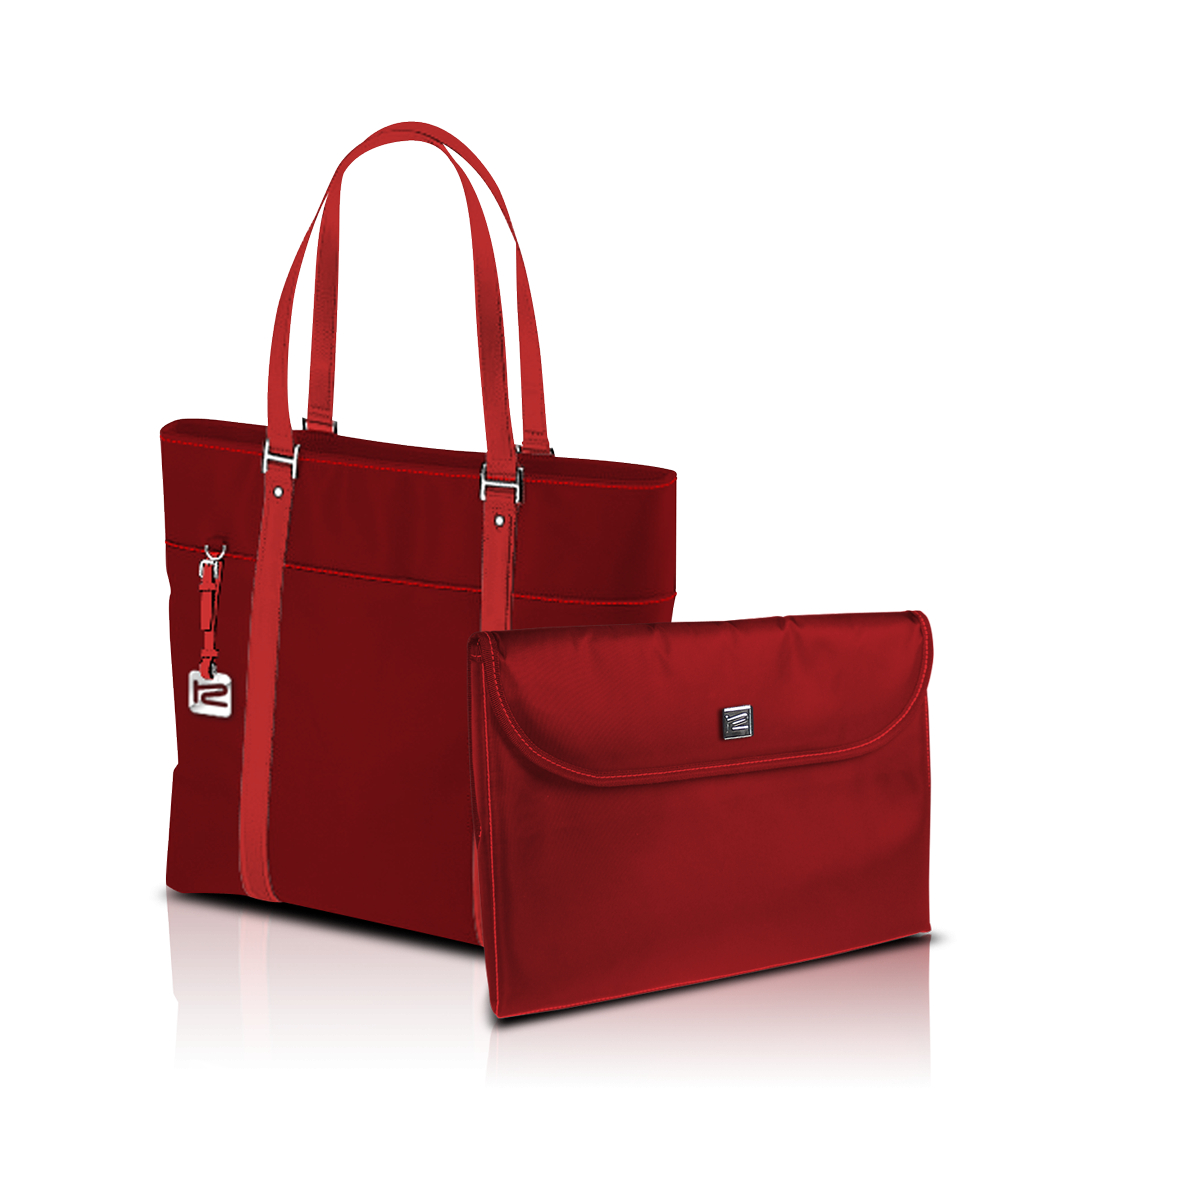 "KlipX Verona Handbag in Red up to 15.4"" (KNB-460RD)"